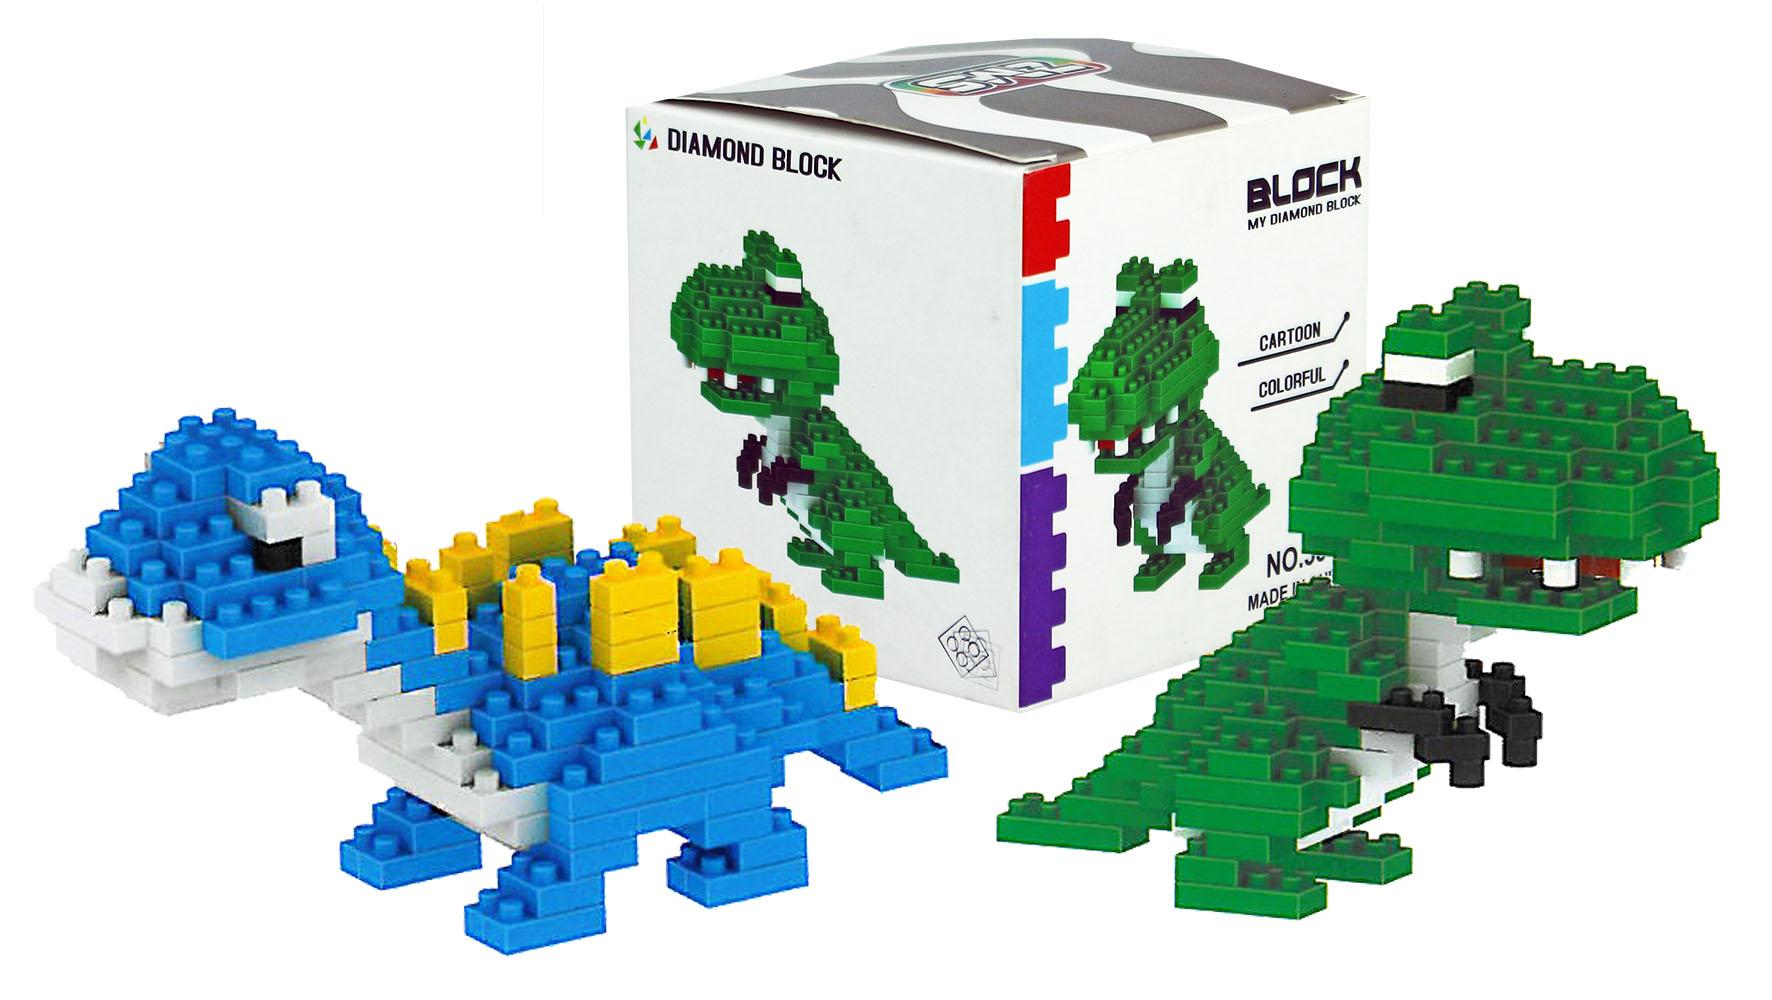 stavebnice mikro dino / krokodíl, 2 druhy